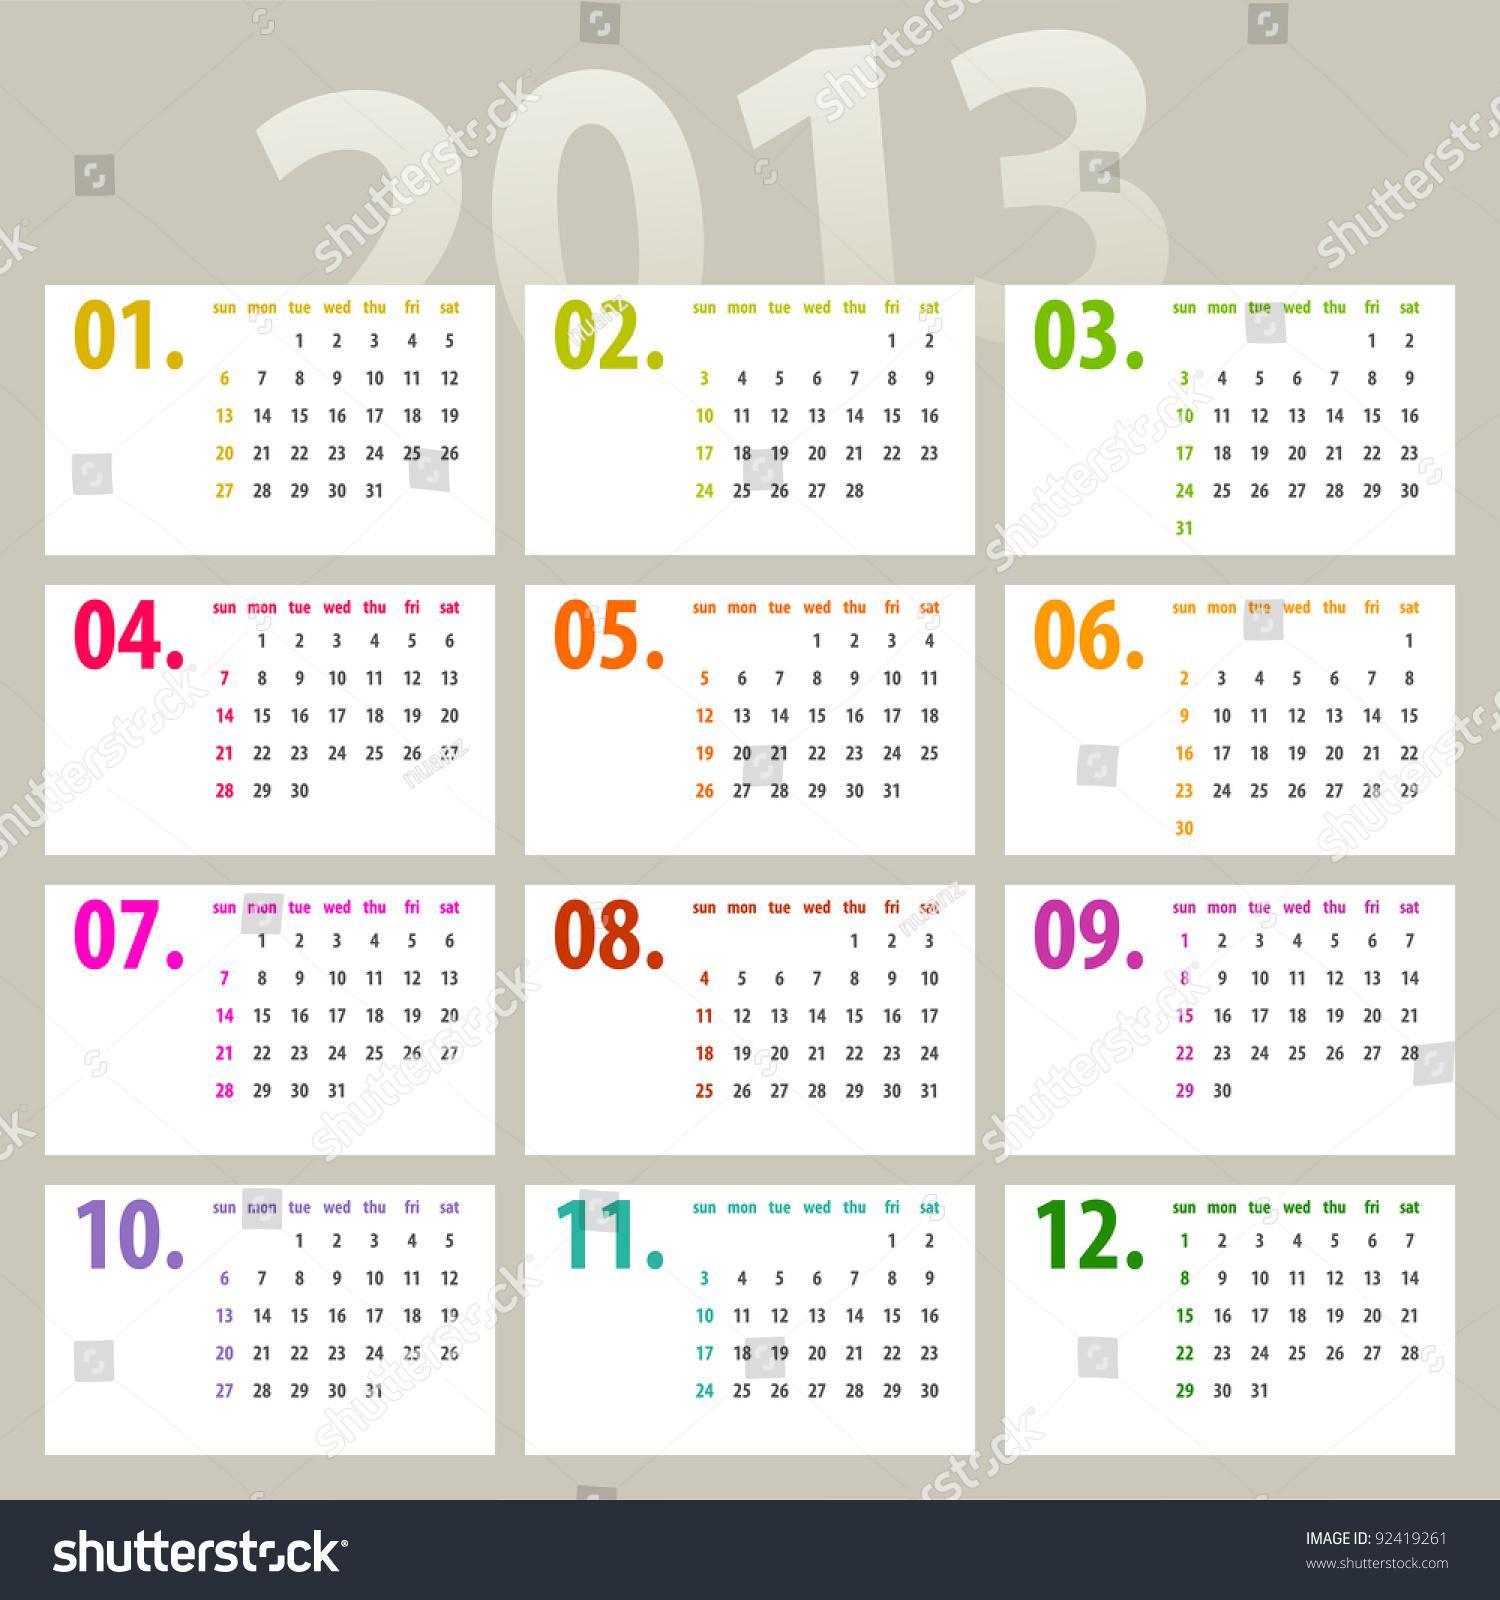 Minimalistic Calendar Design : Minimalistic calendar design week starts with